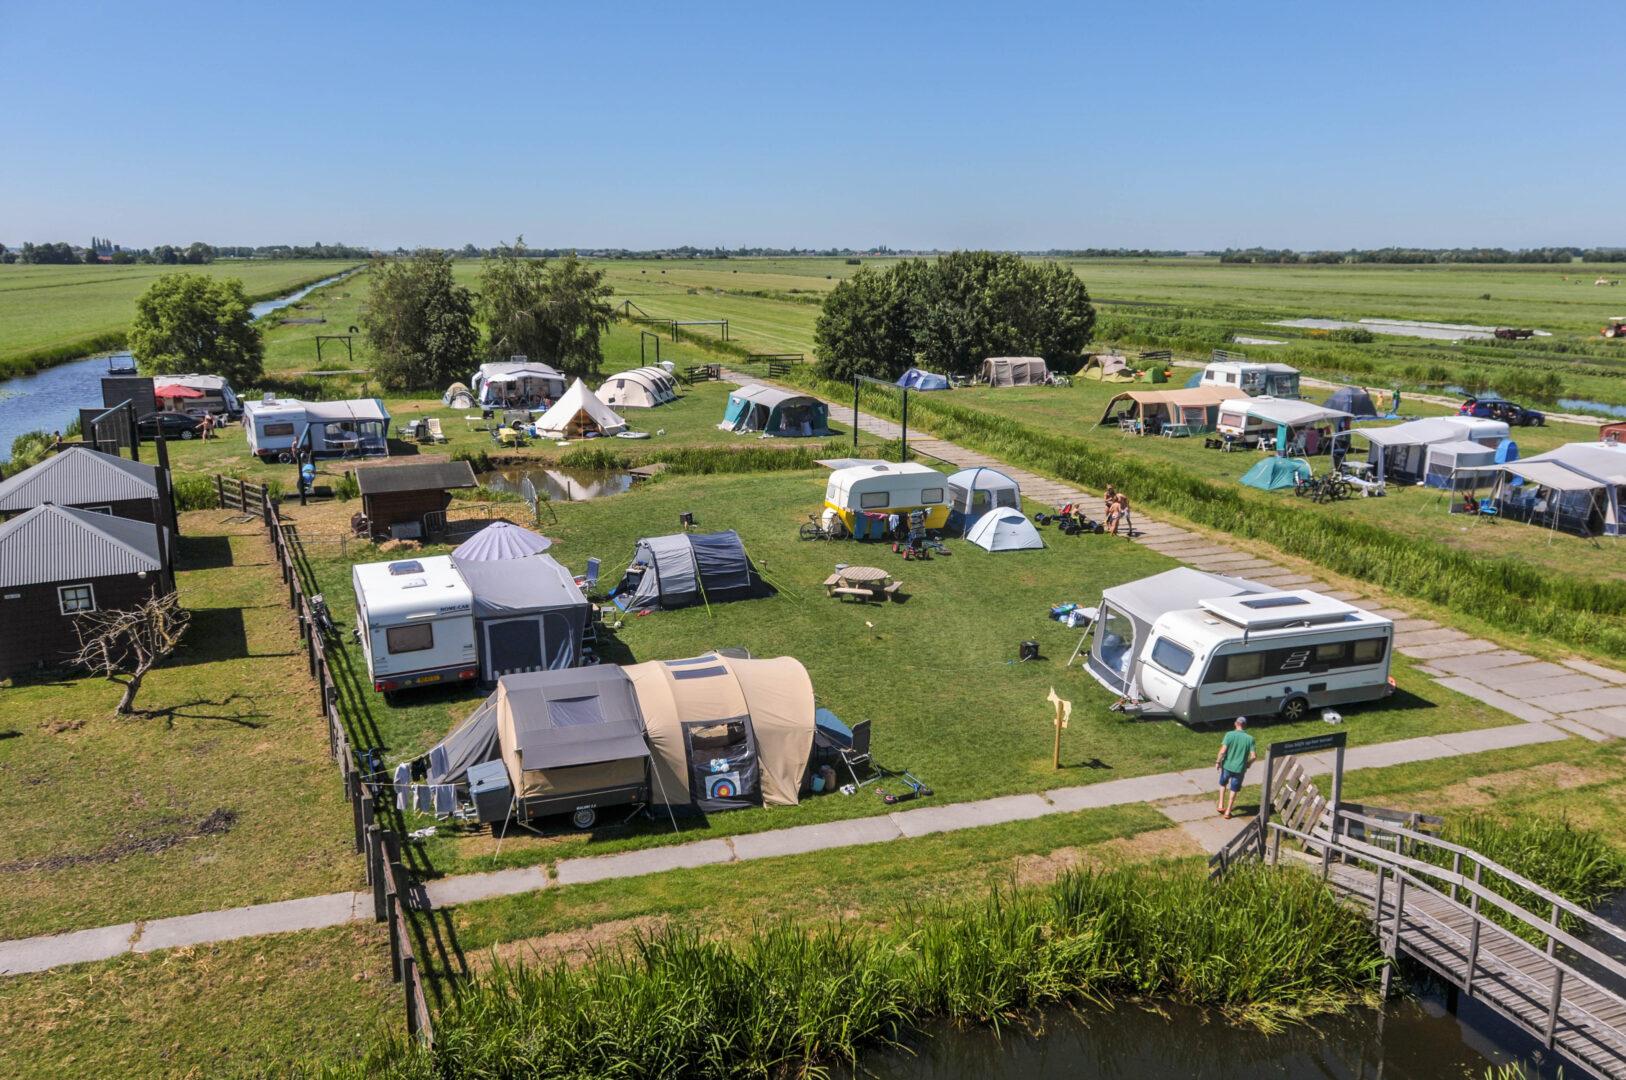 Camping de Boerinn